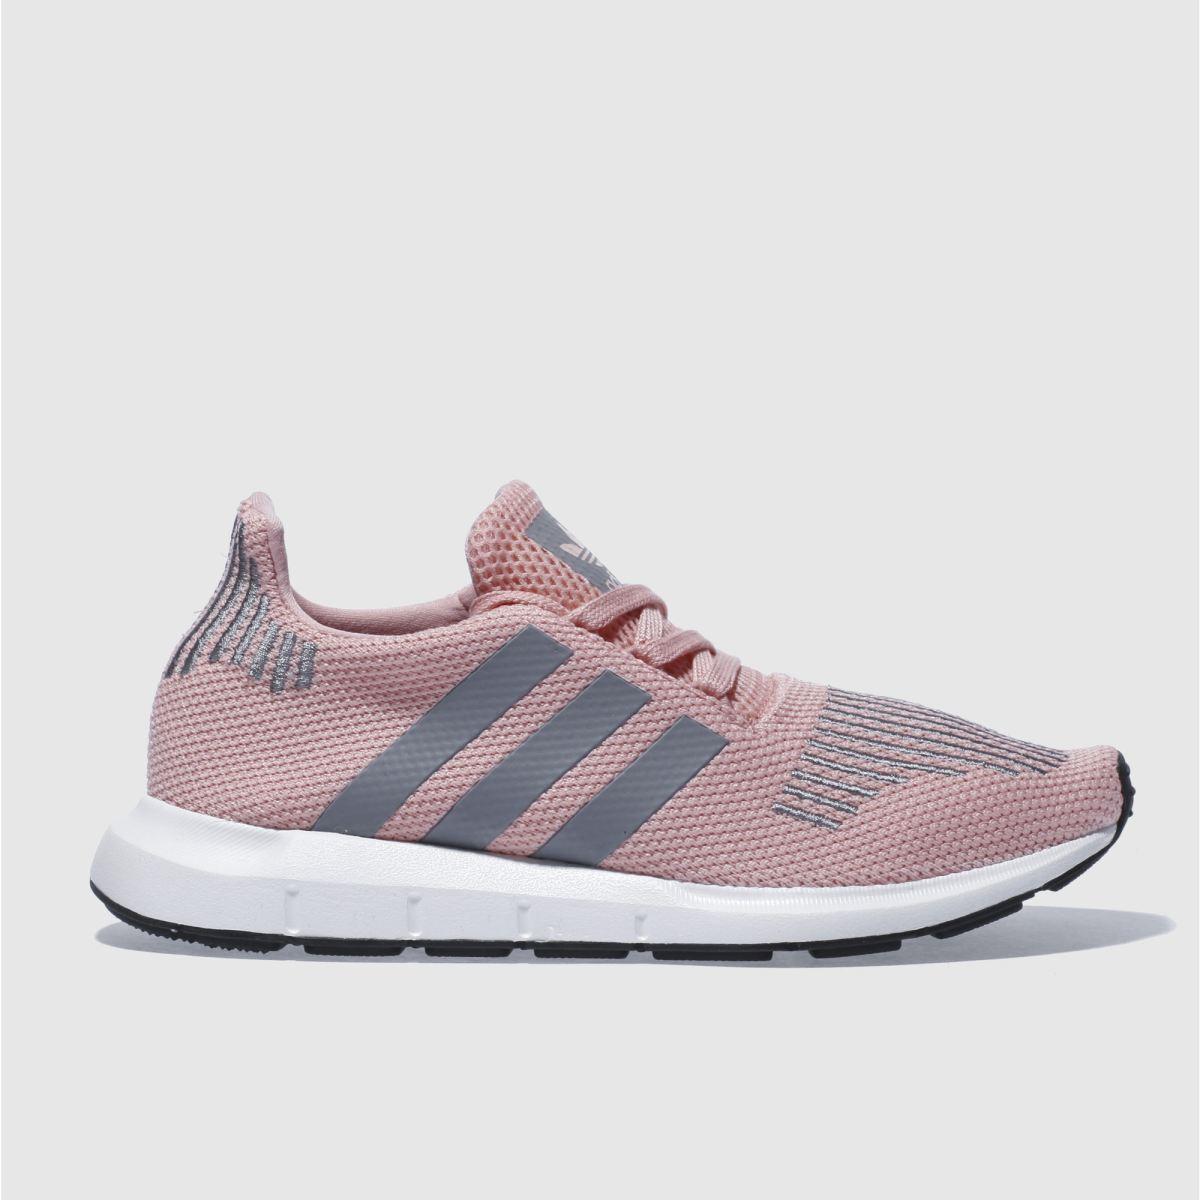 adidas pale pink swift run trainers